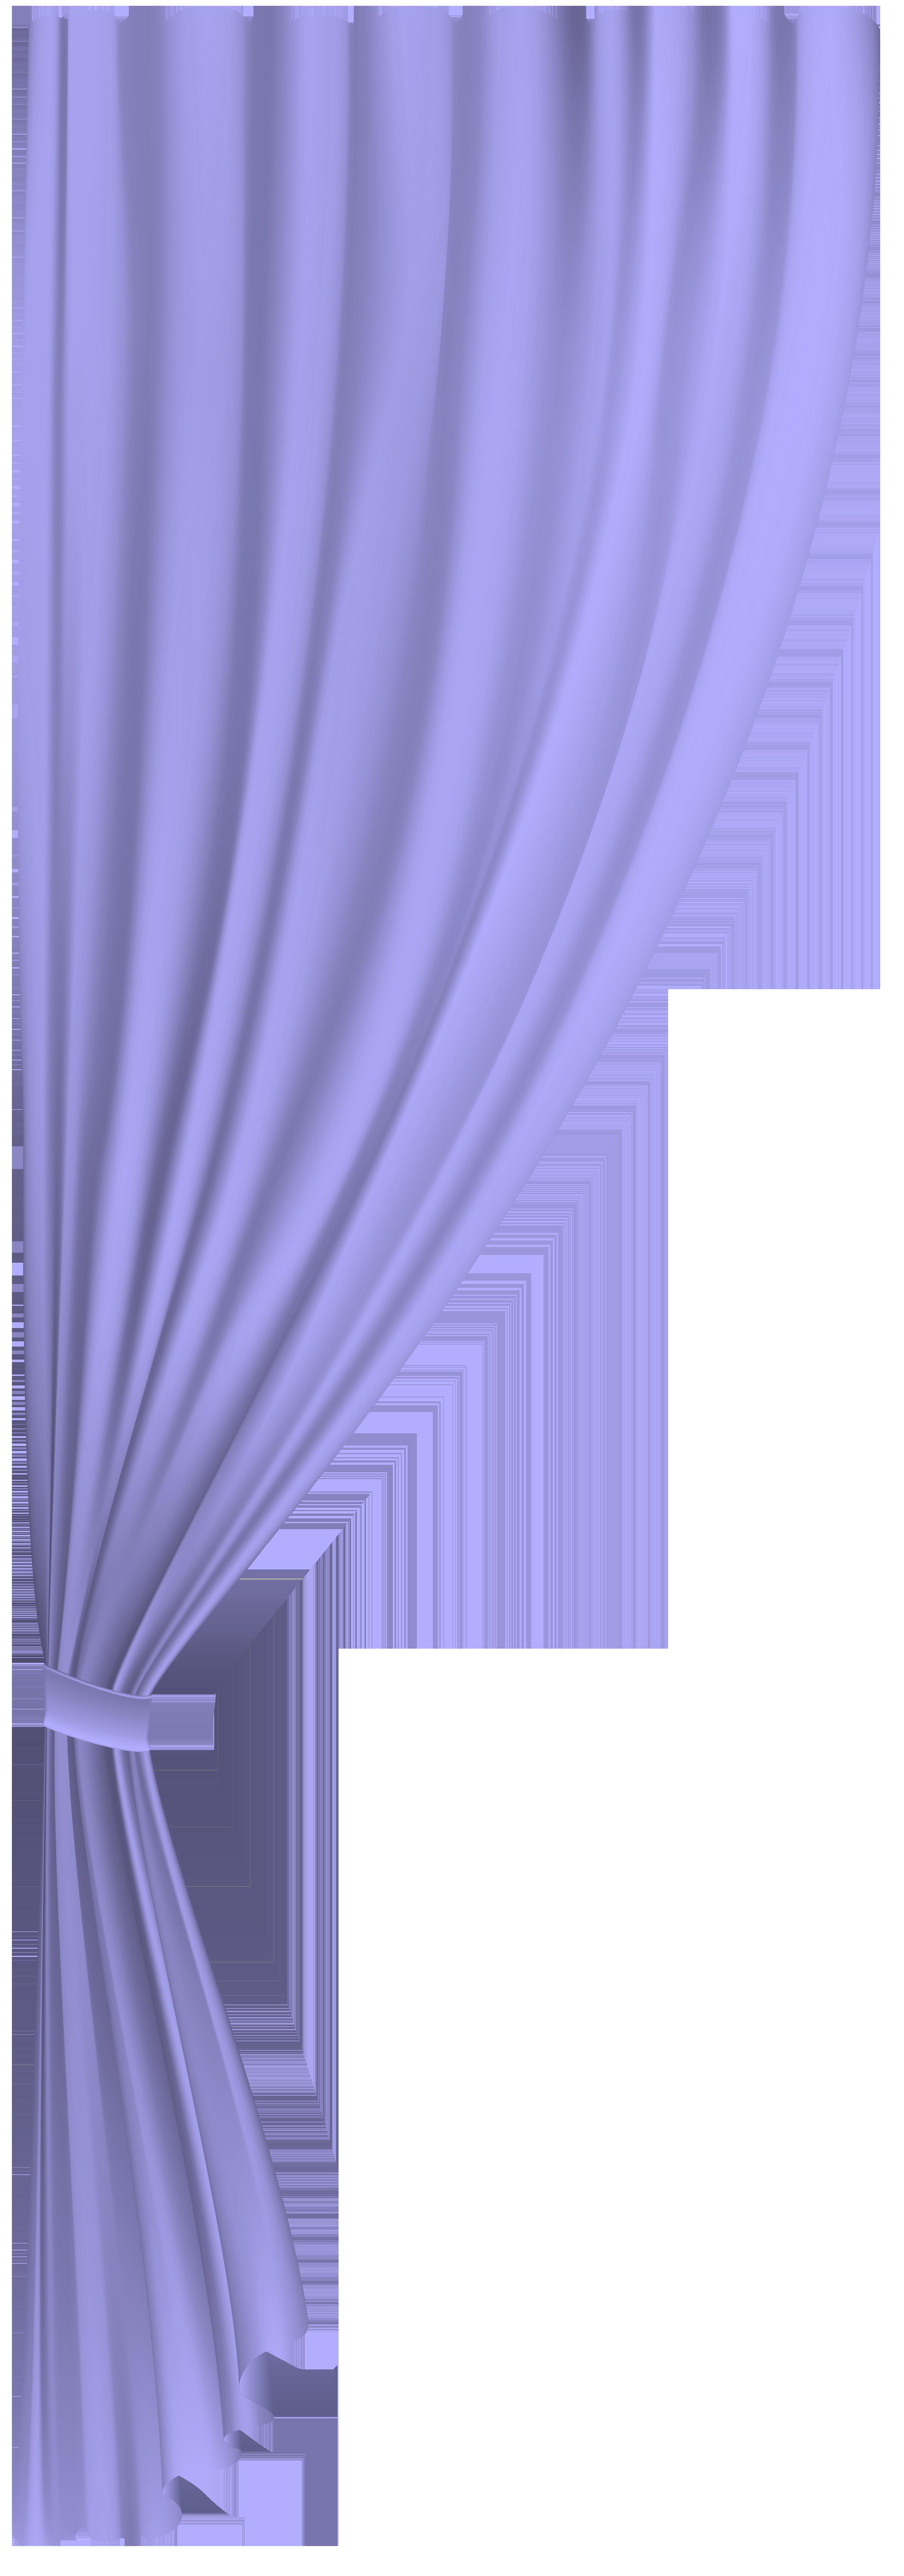 Curtains clipart animated. Violet curtain transparent clip